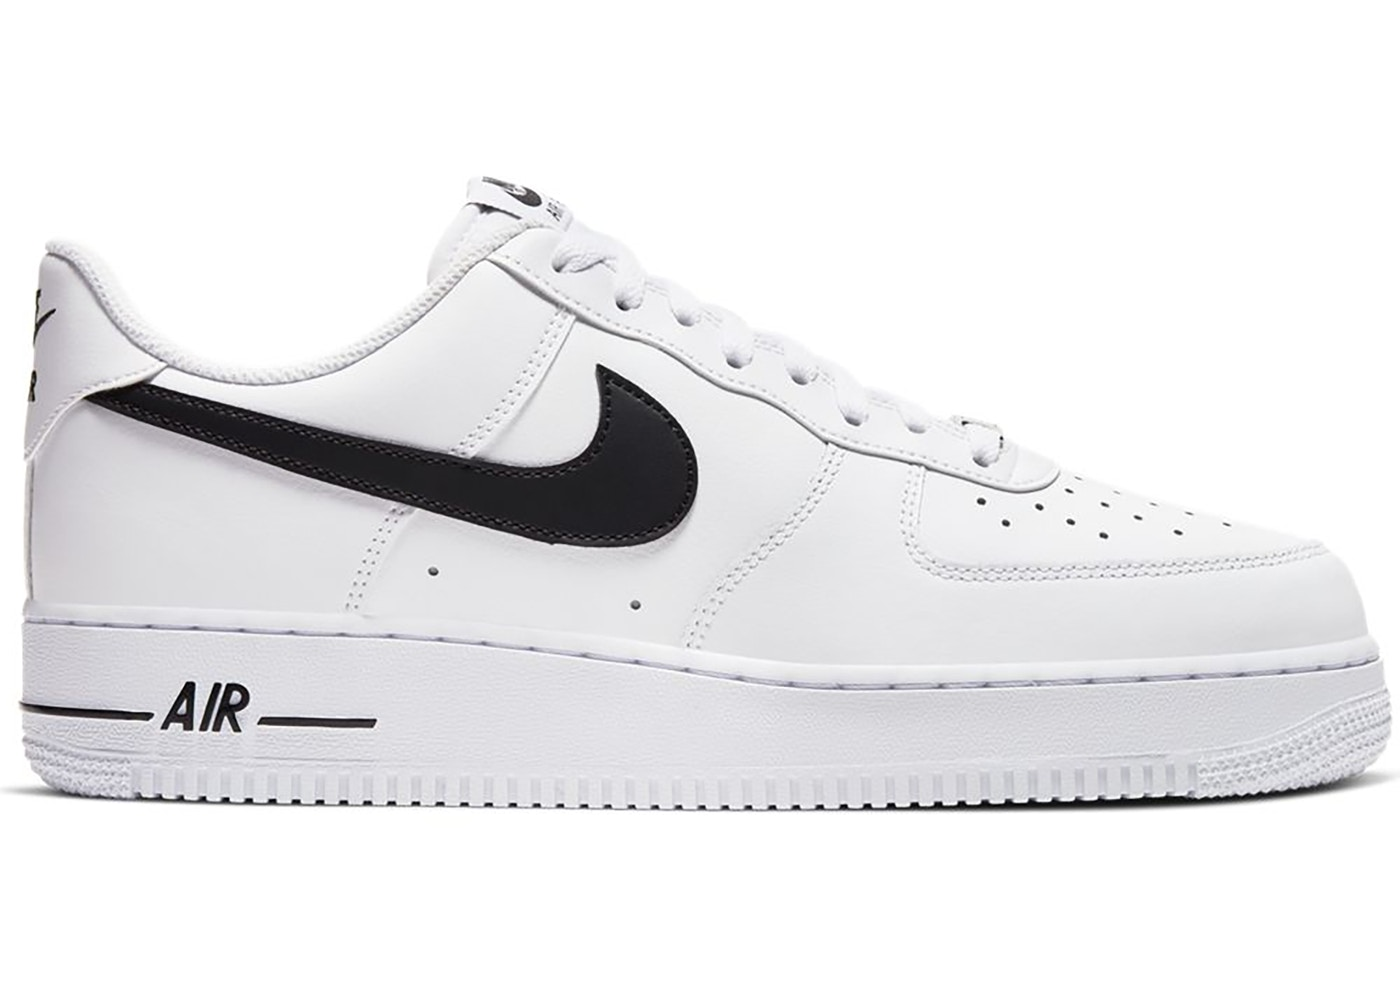 Nike Air Force 1 Low White Black (2020)